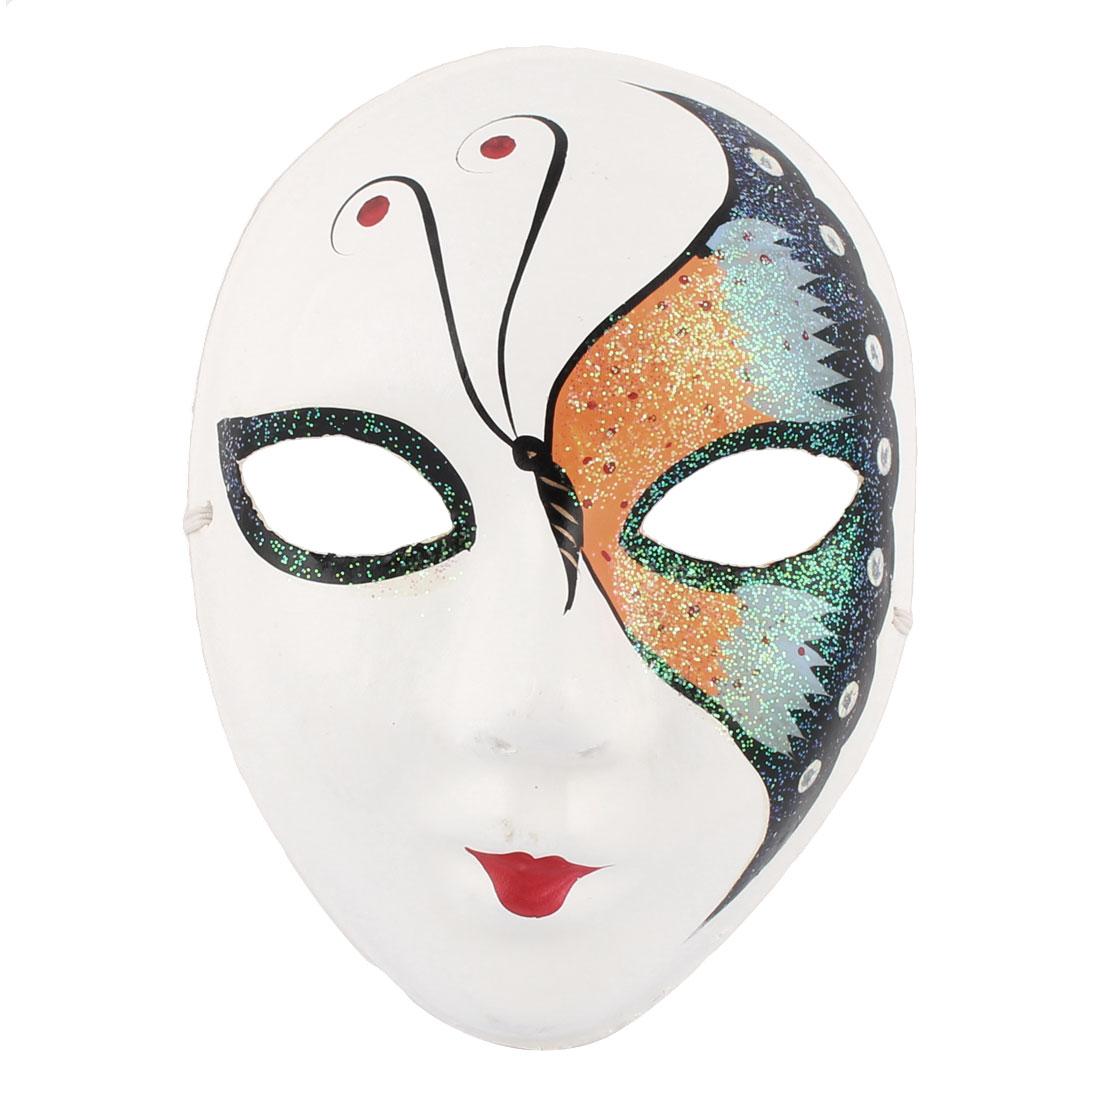 Woman Gypsum Hand Paint Beijing Peking Opera Facial Fashion Costume Makeup Mask